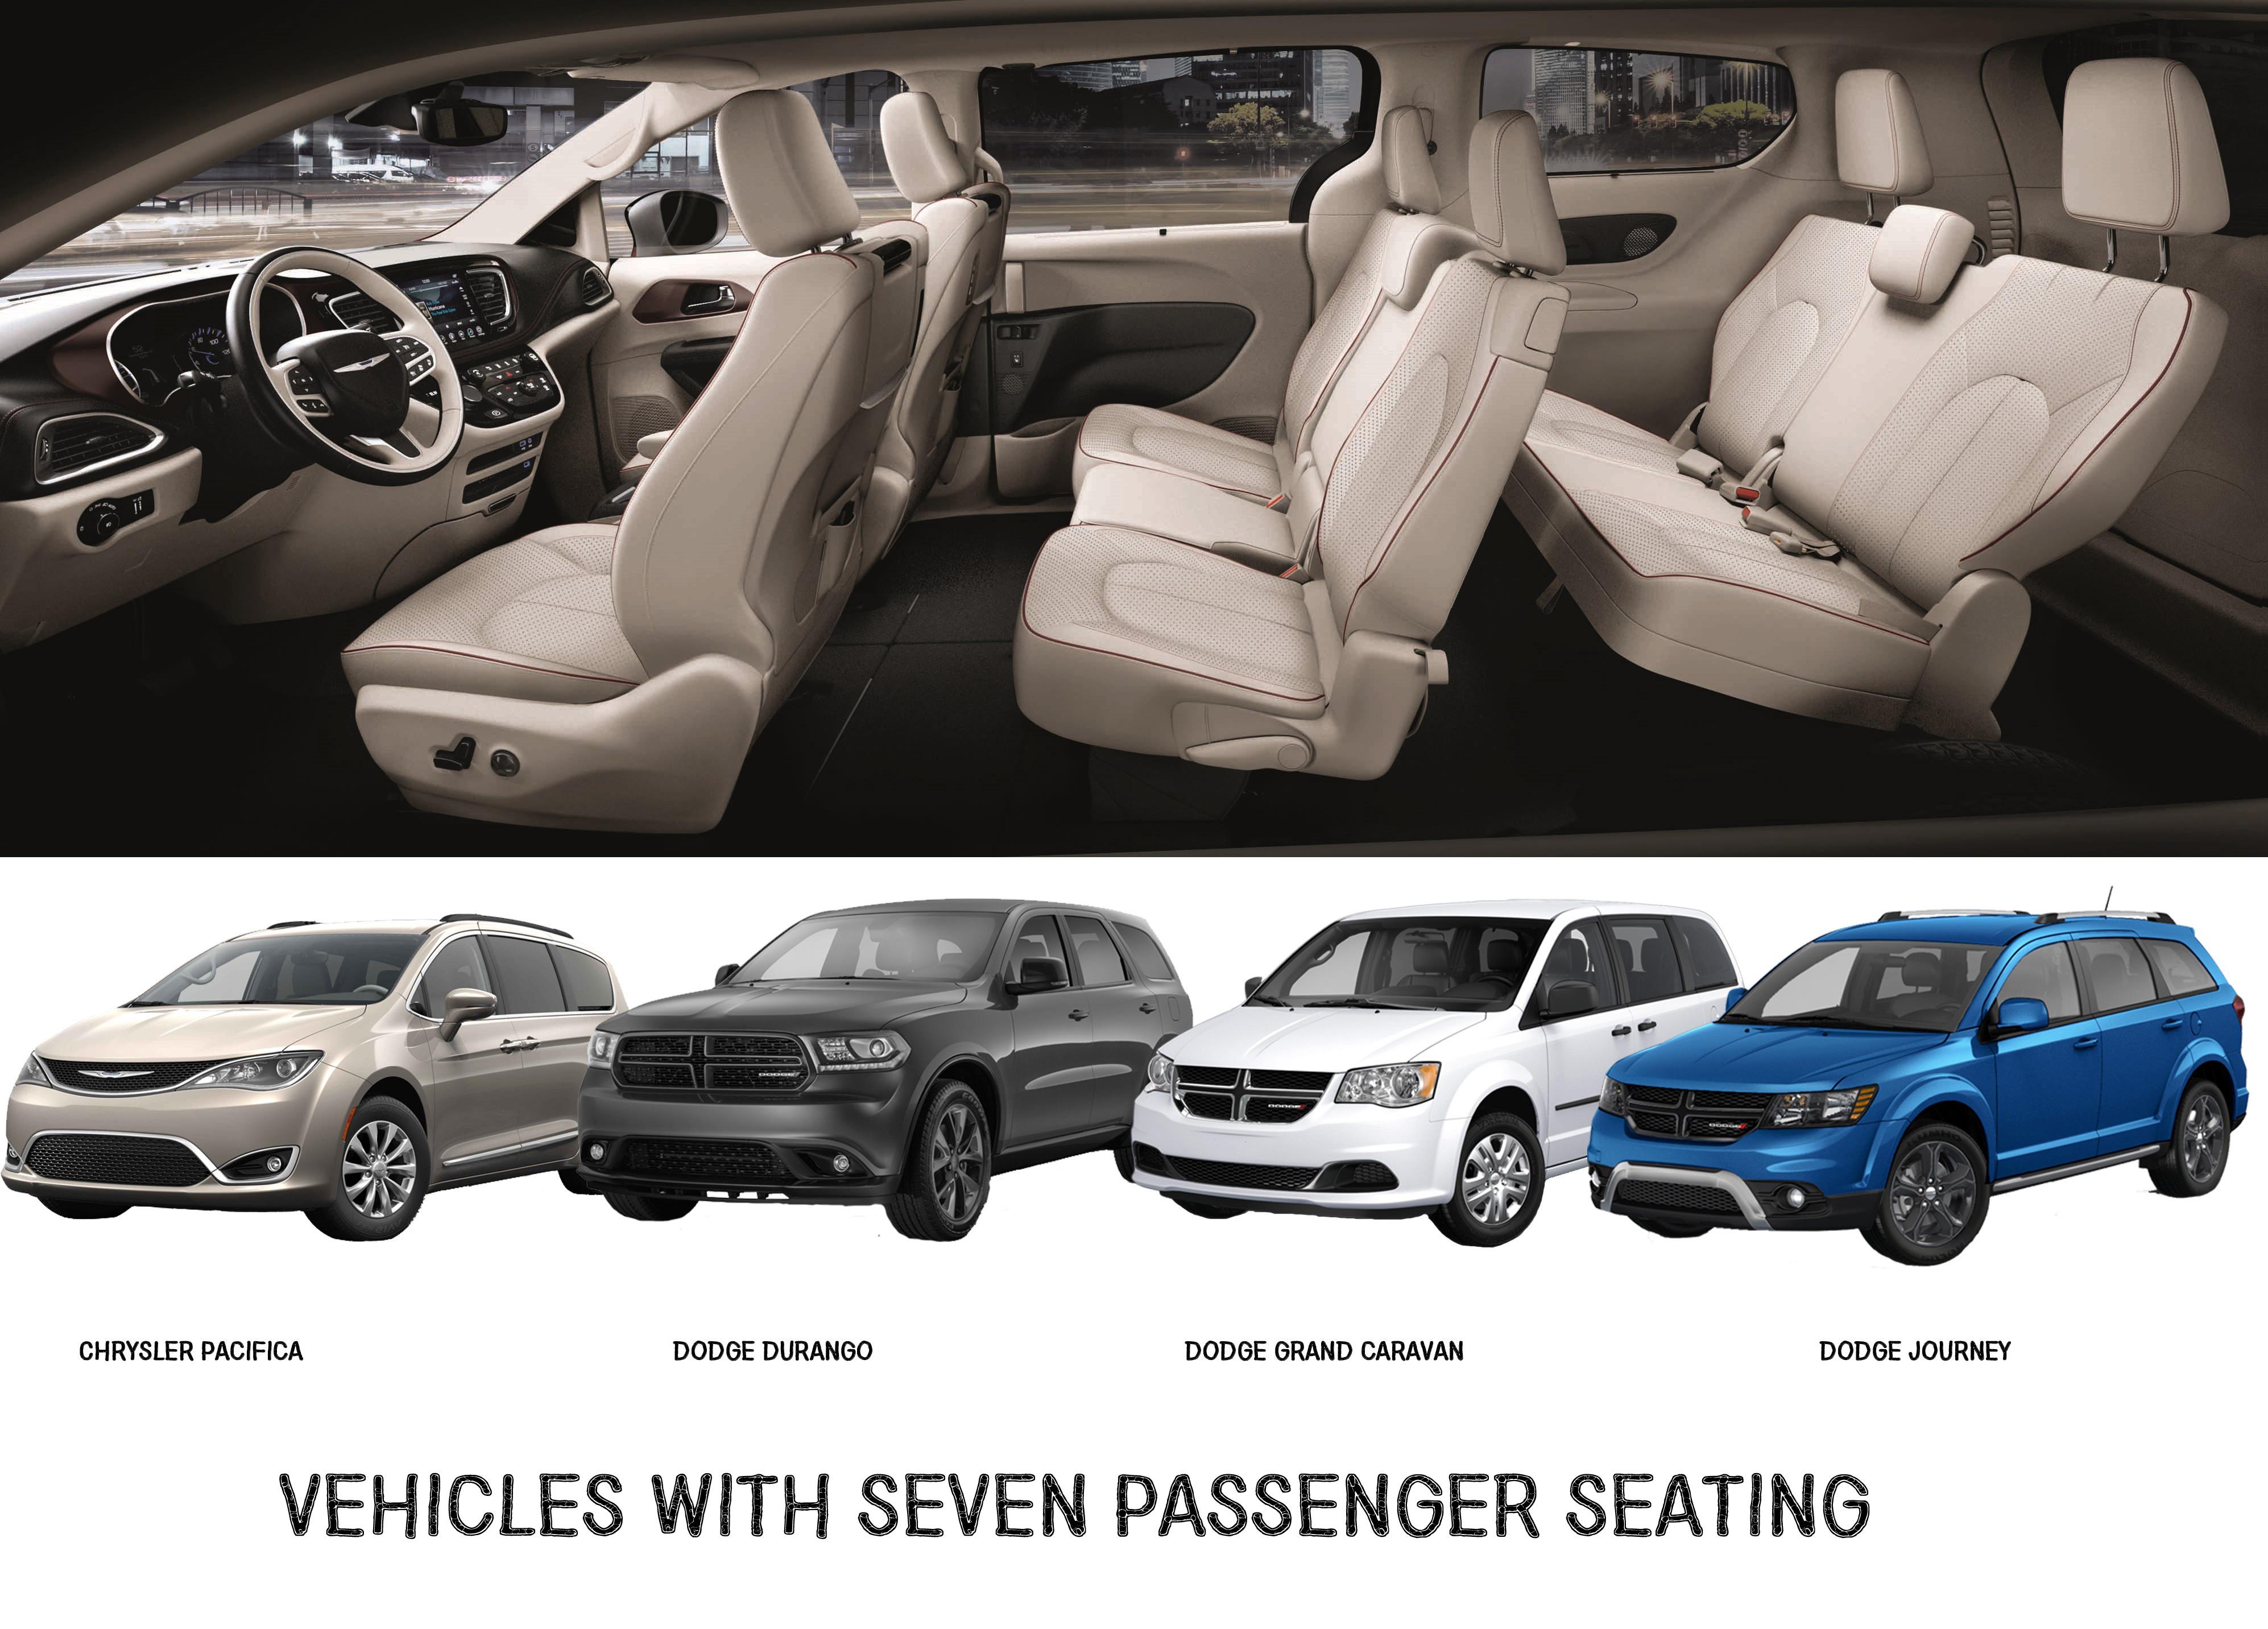 7 Passenger Seating Vehicles Dodge And Chrysler Aventura Chrysler Jeep Dodge Ram